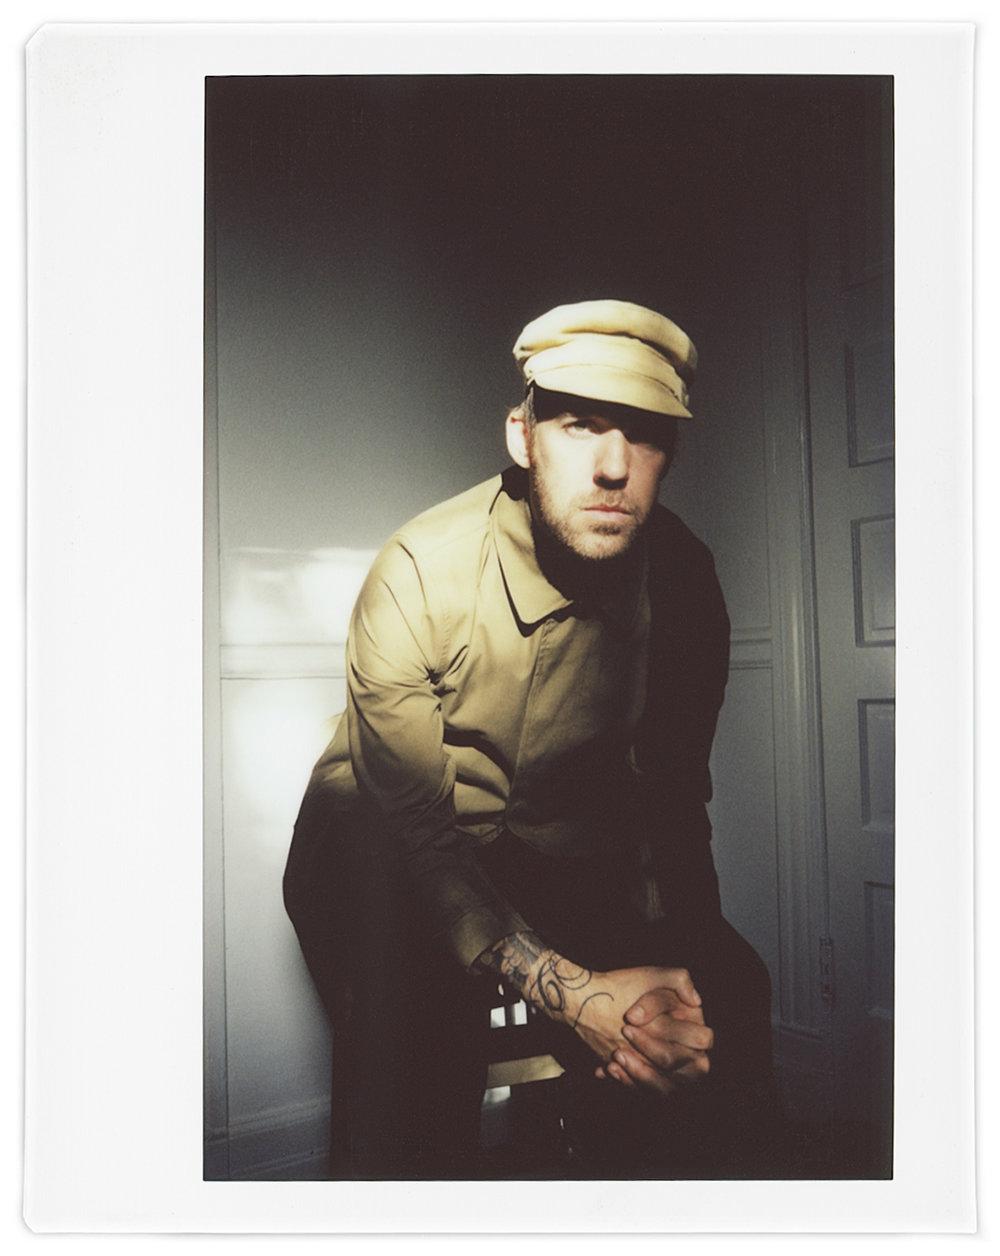 Andrew James, Guitarist, Singer & Songwriter (UK)